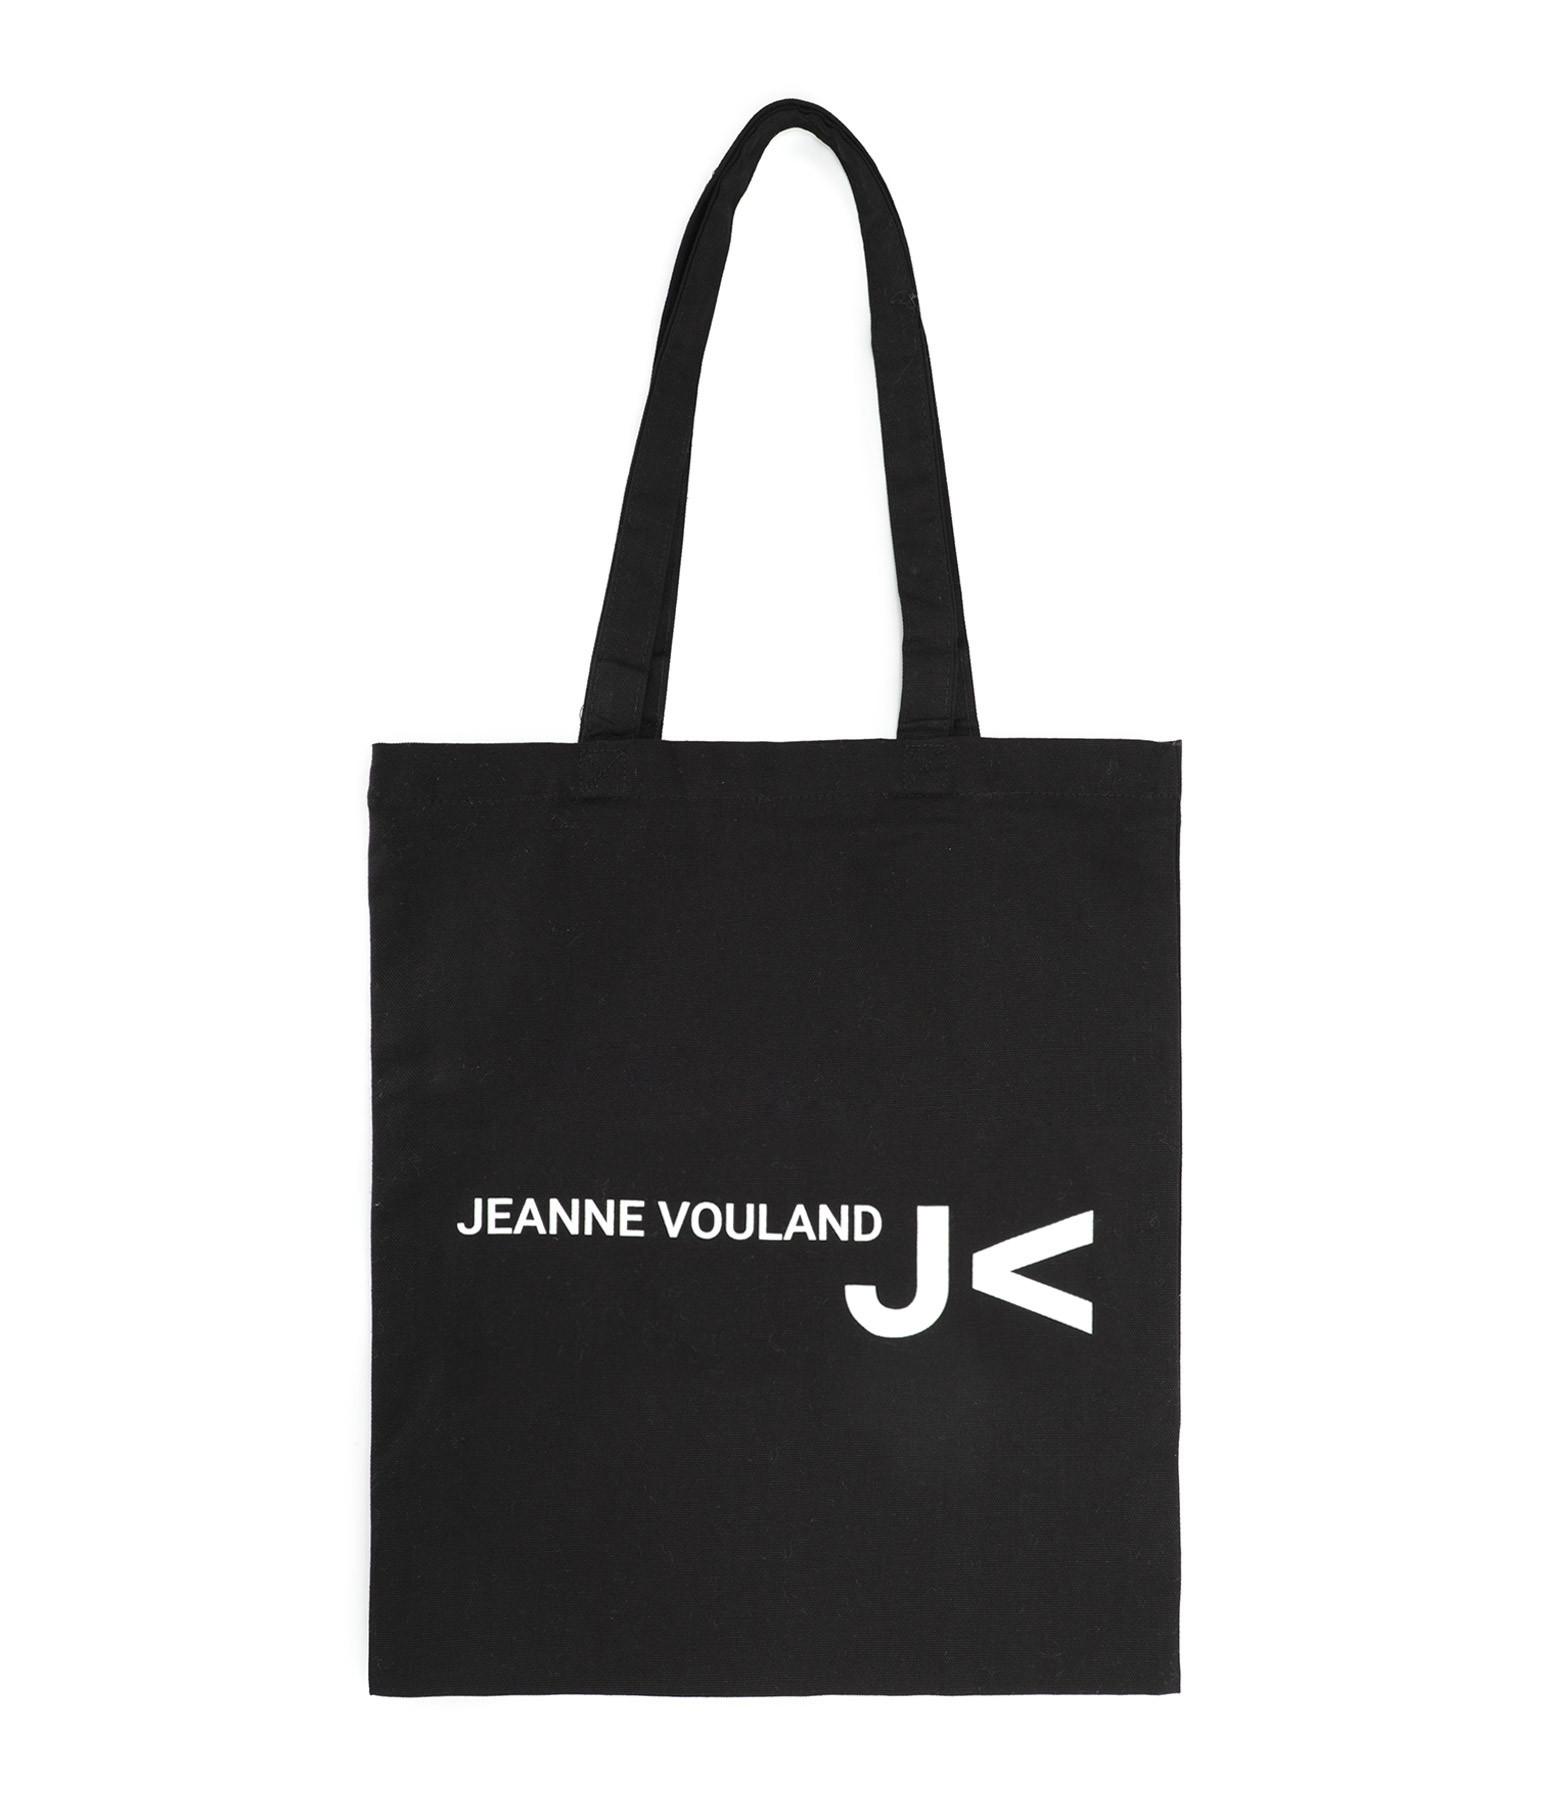 JEANNE VOULAND - Tote bag You are Special Jeanne Vouland Noir